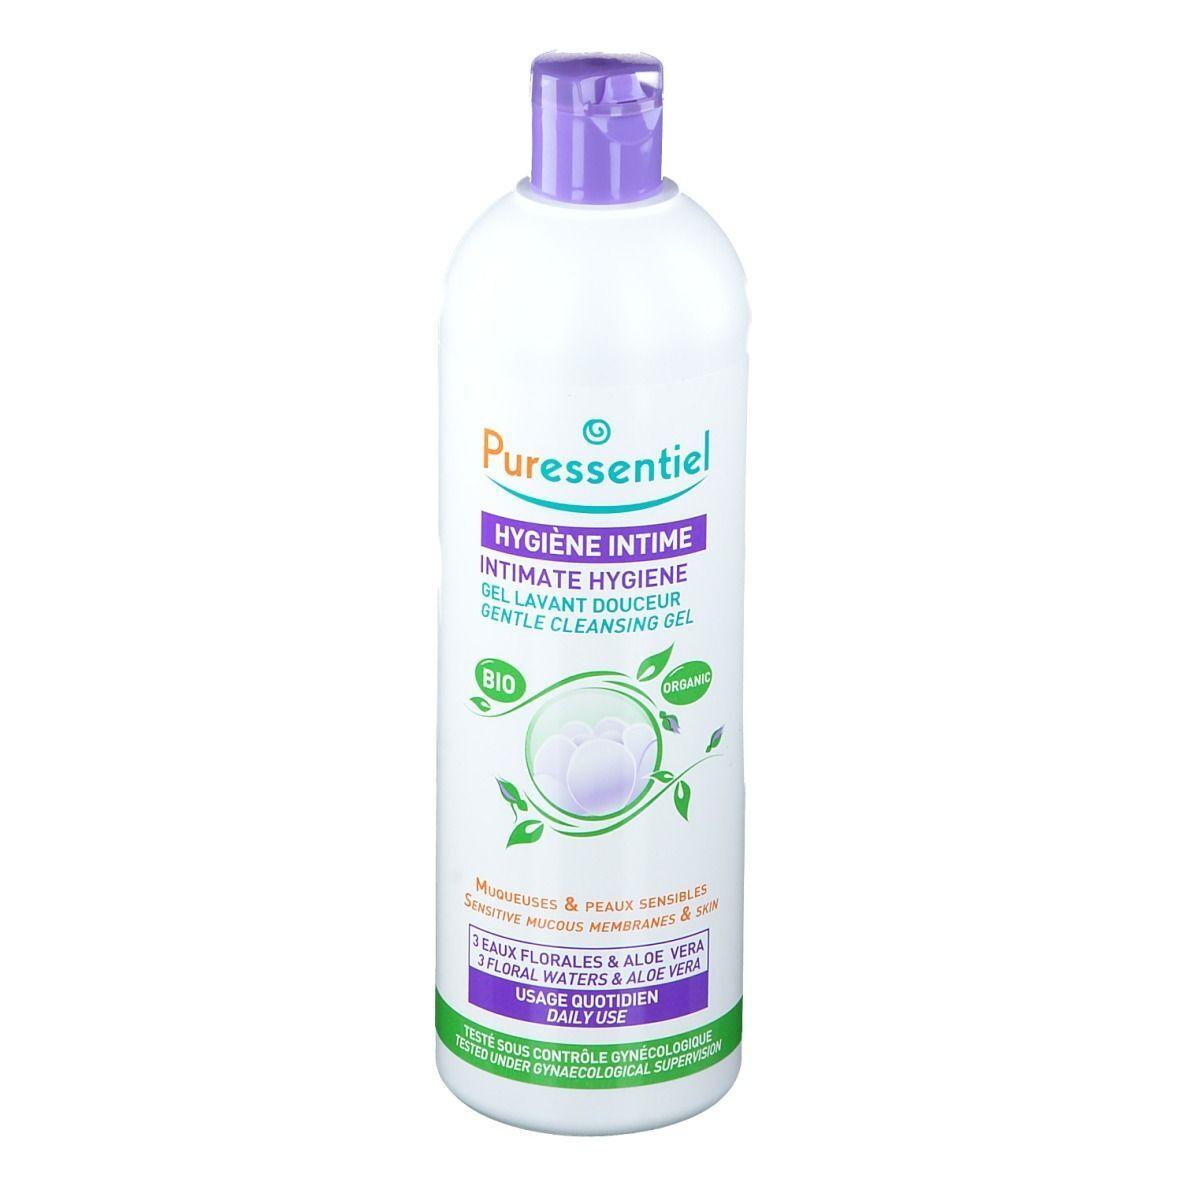 Puressentiel Hygiène Intime Gel Lavant Douceur Bio ml gel(s)